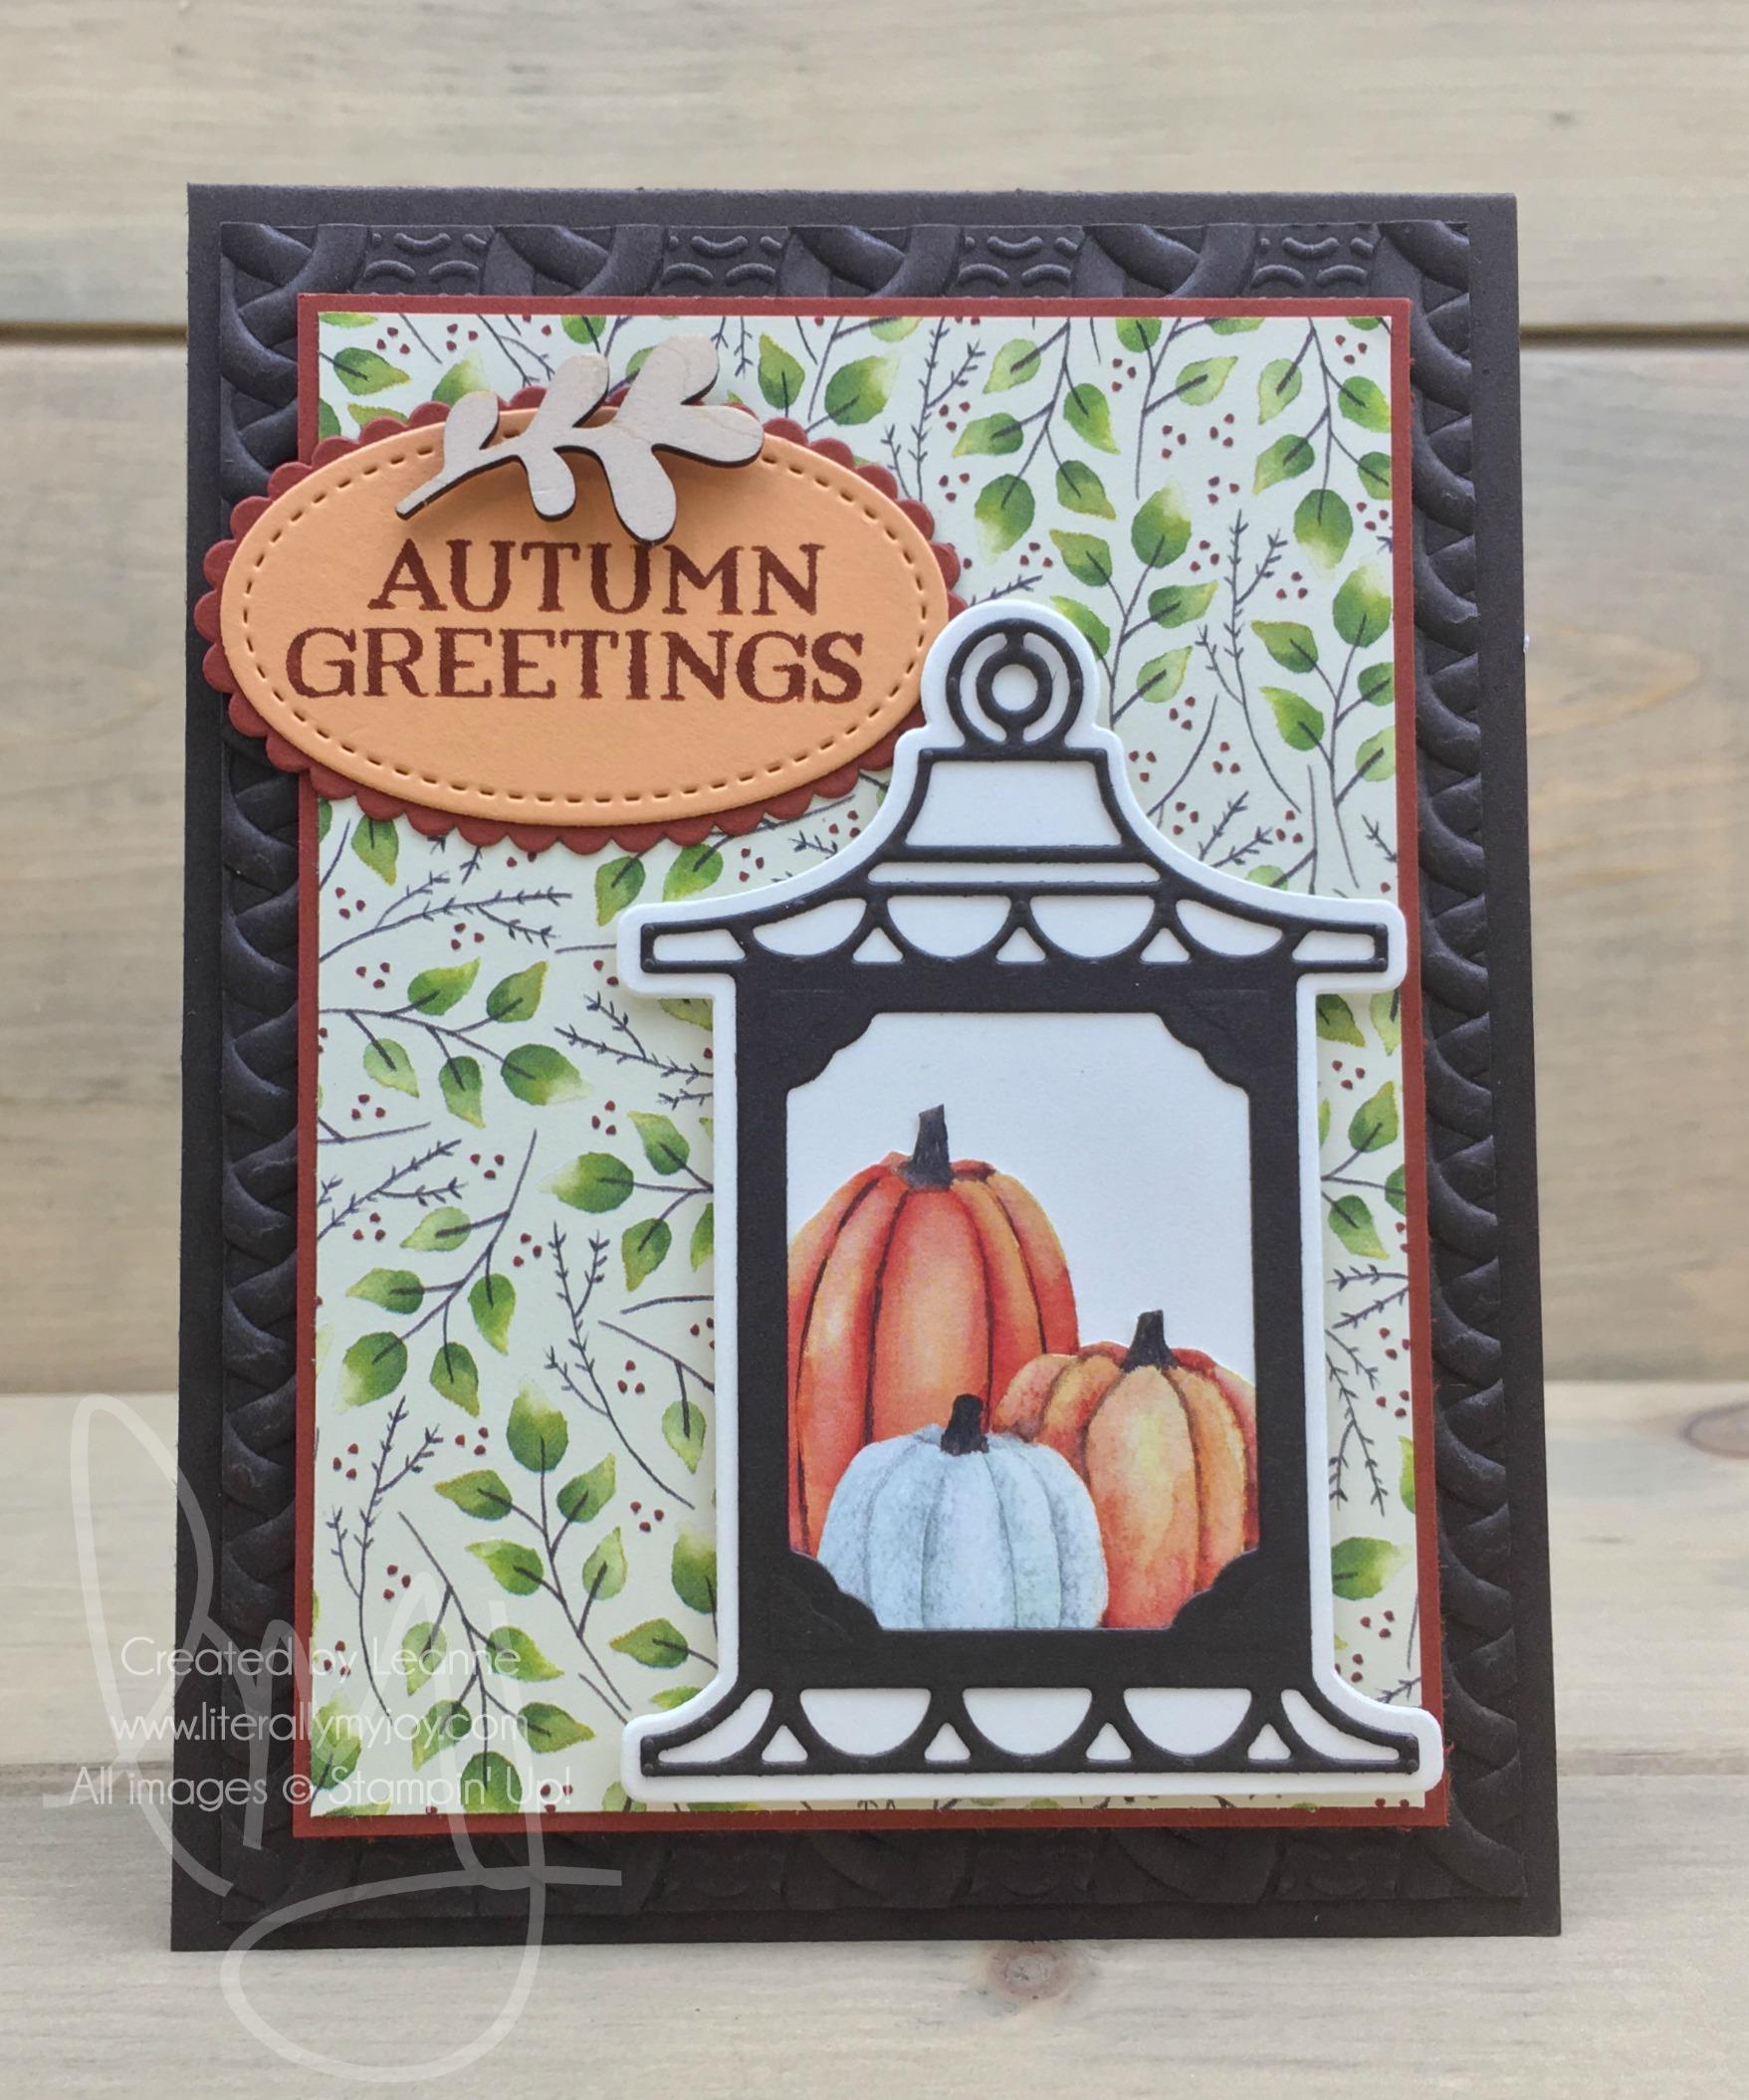 Autumn Greetings.jpg